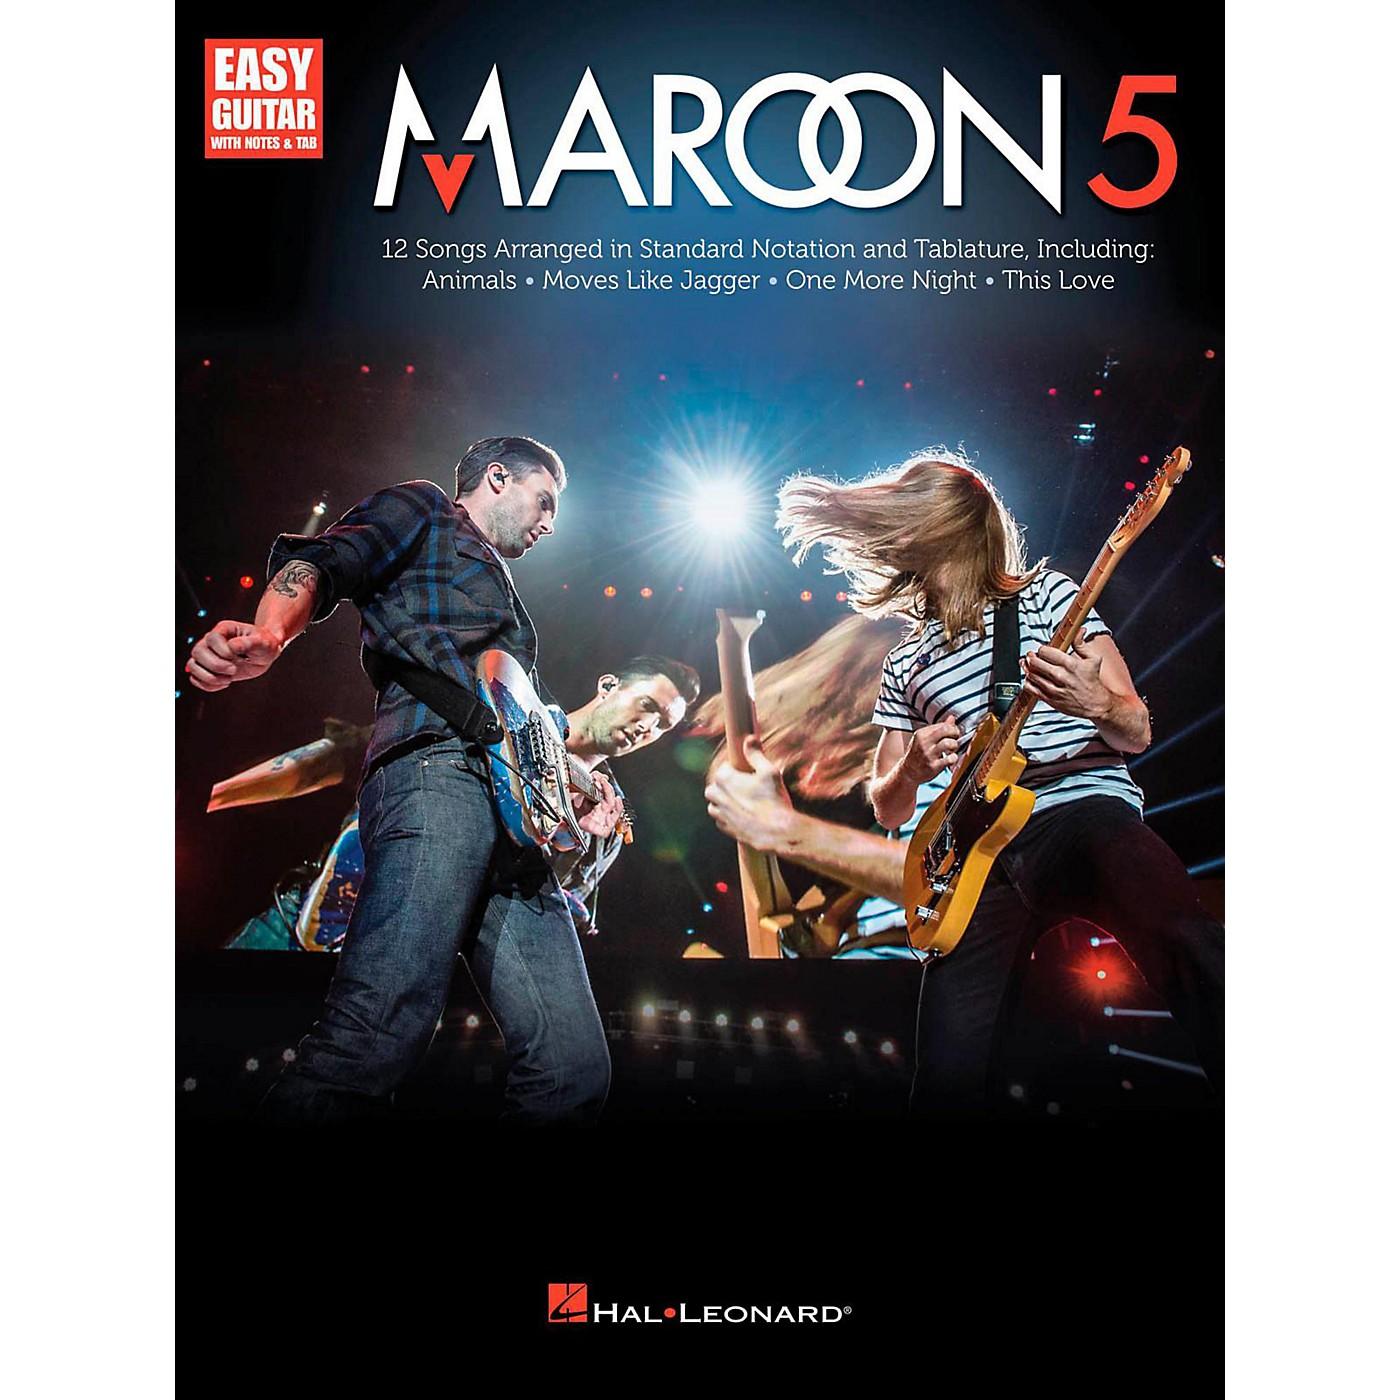 Hal Leonard Maroon 5 for Easy Guitar (With Tab) thumbnail